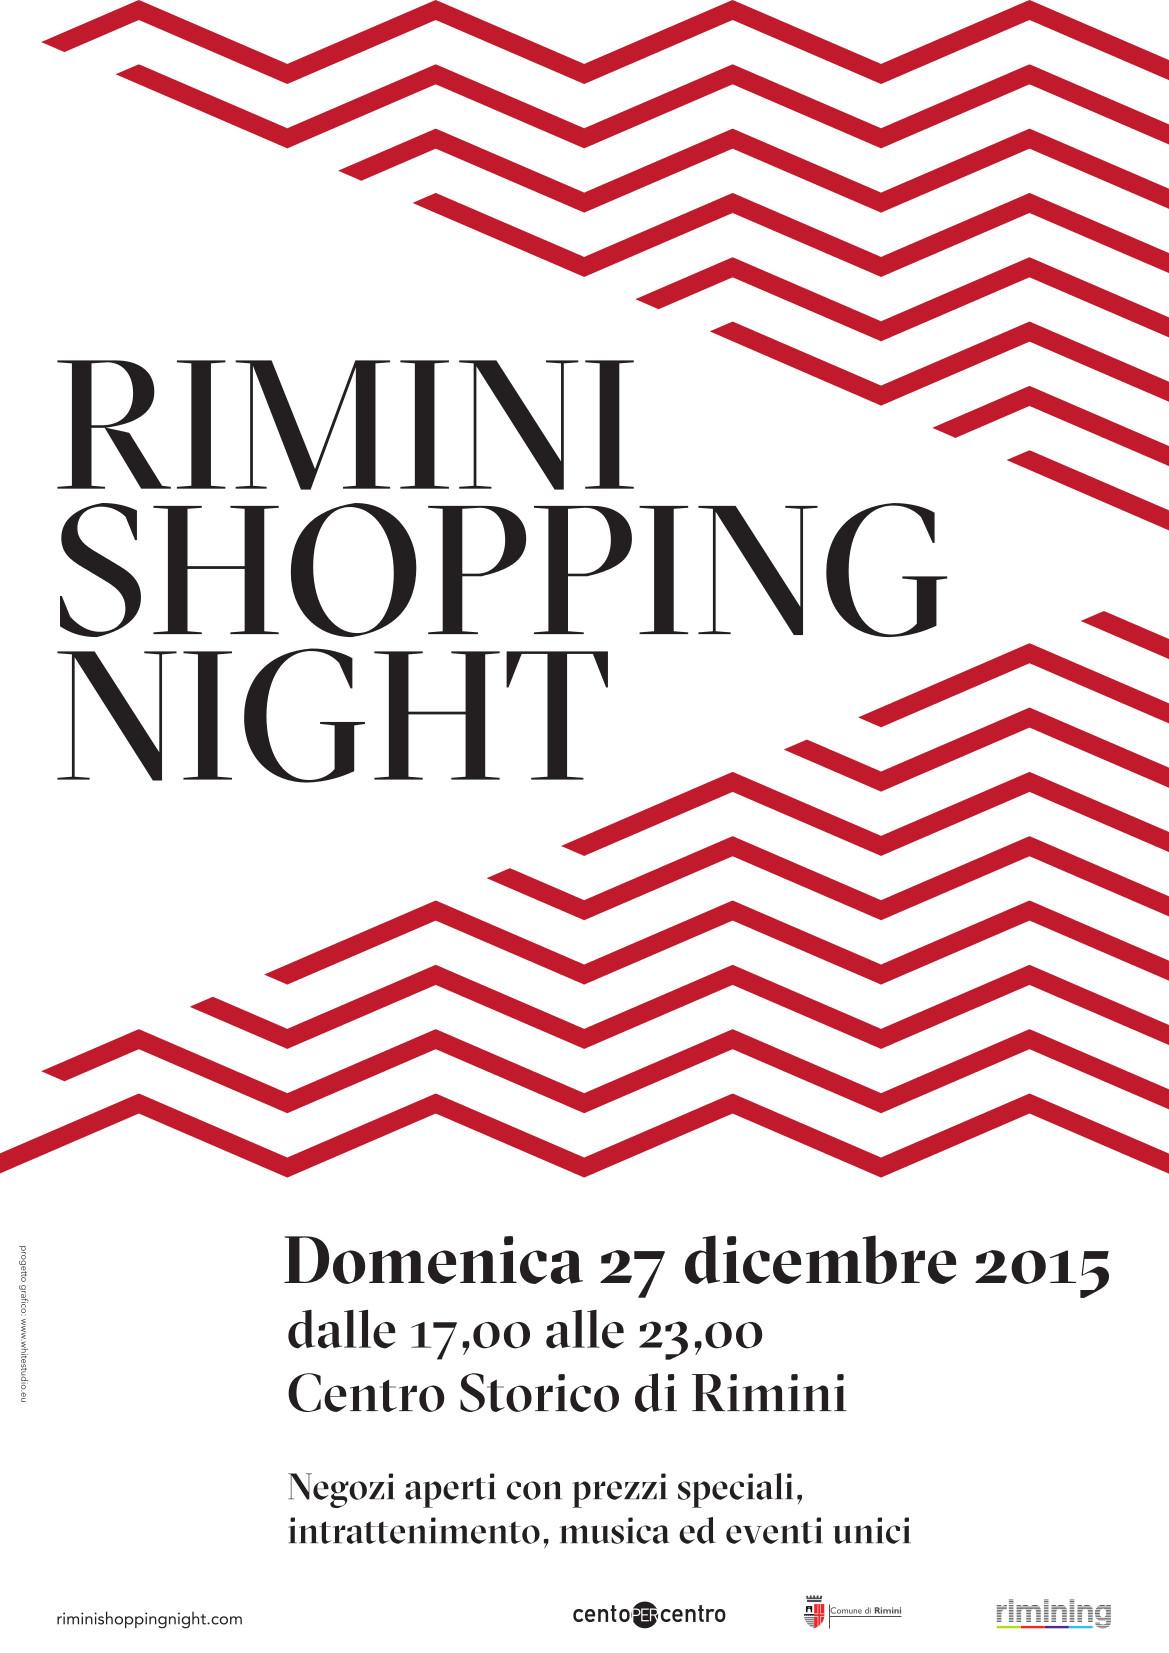 Locandina Rimini Shopping Night - Natale 2015